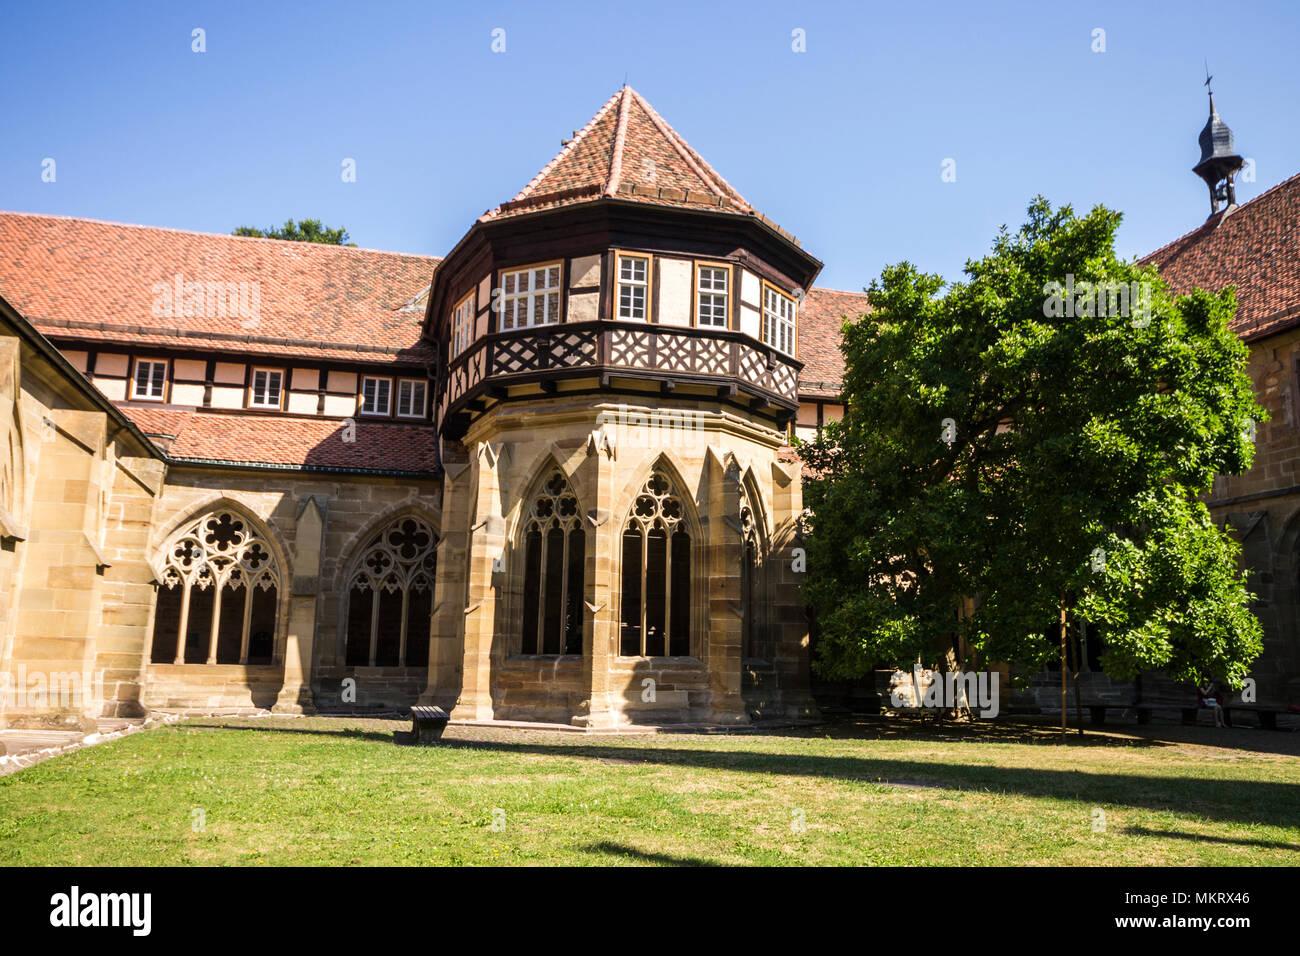 Maulbronn, Germany. Brunnenhaus or well house in the cloister of Maulbronn Monastery (Kloster Maulbronn), a former Roman Catholic Cistercian Abbey Stock Photo